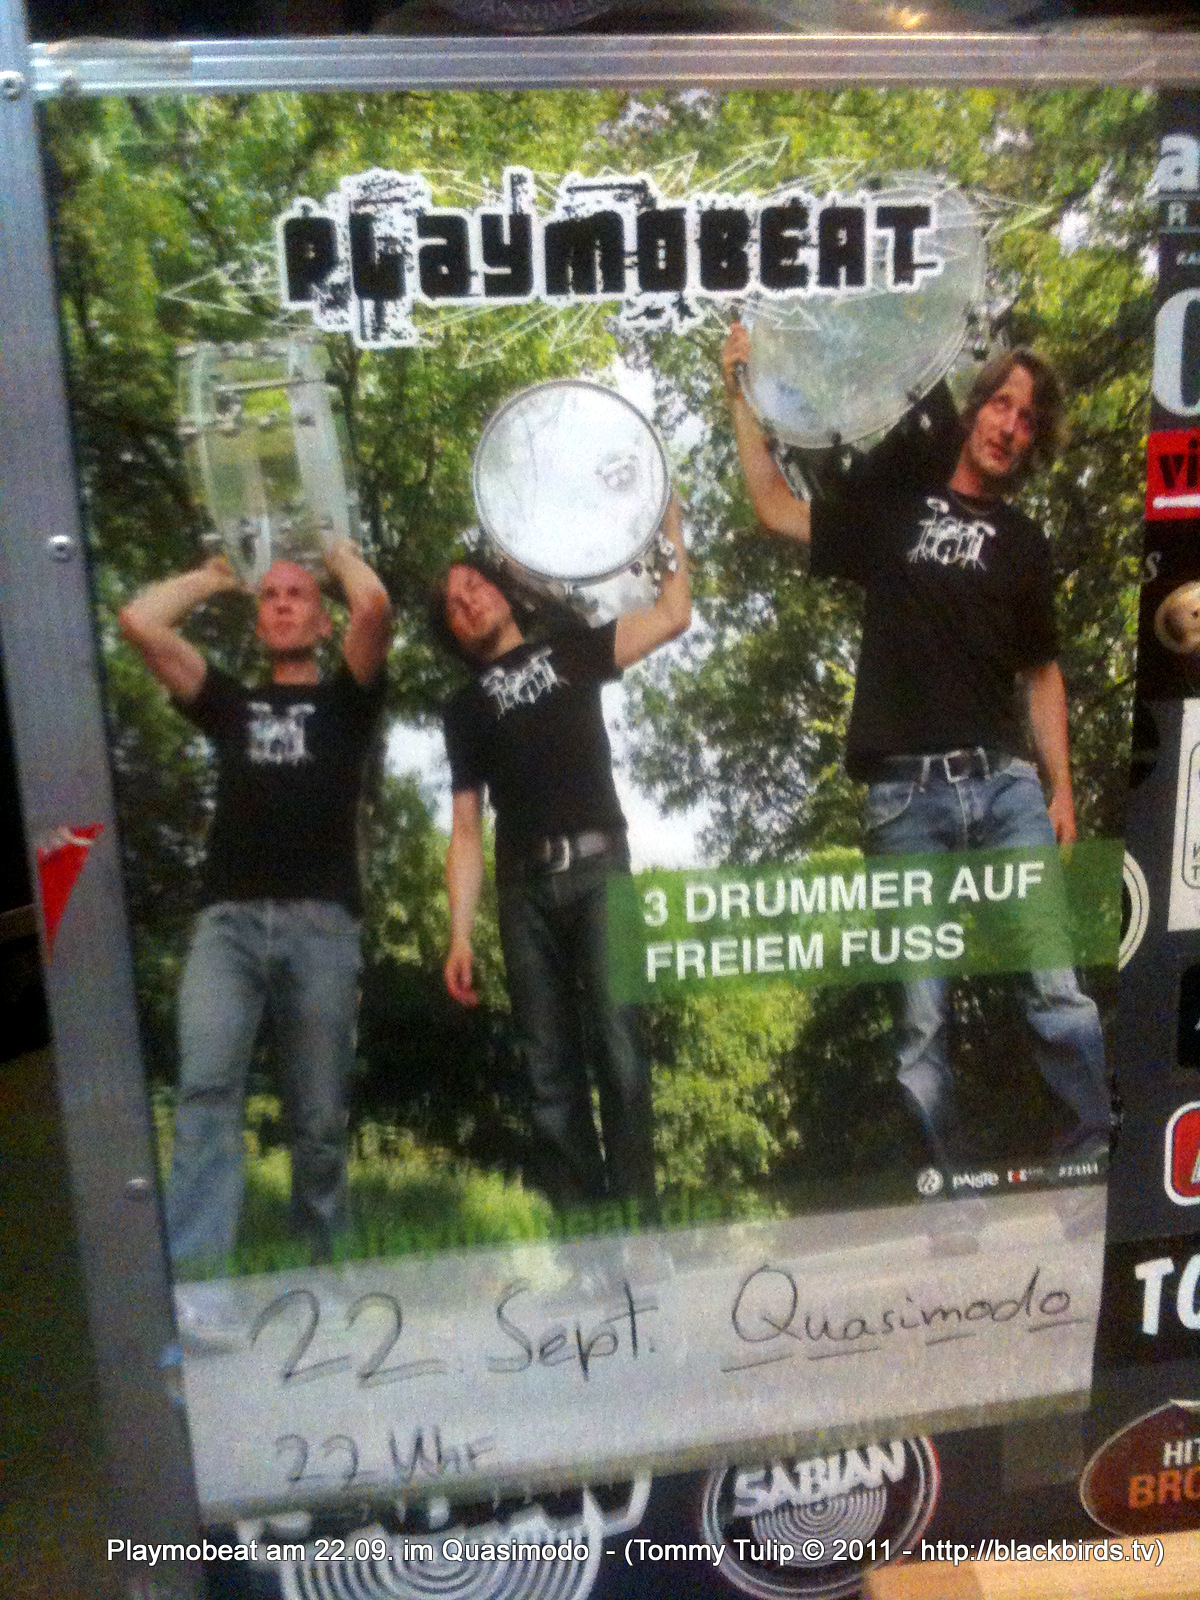 Playmobeat am 22.09. im Quasimodo